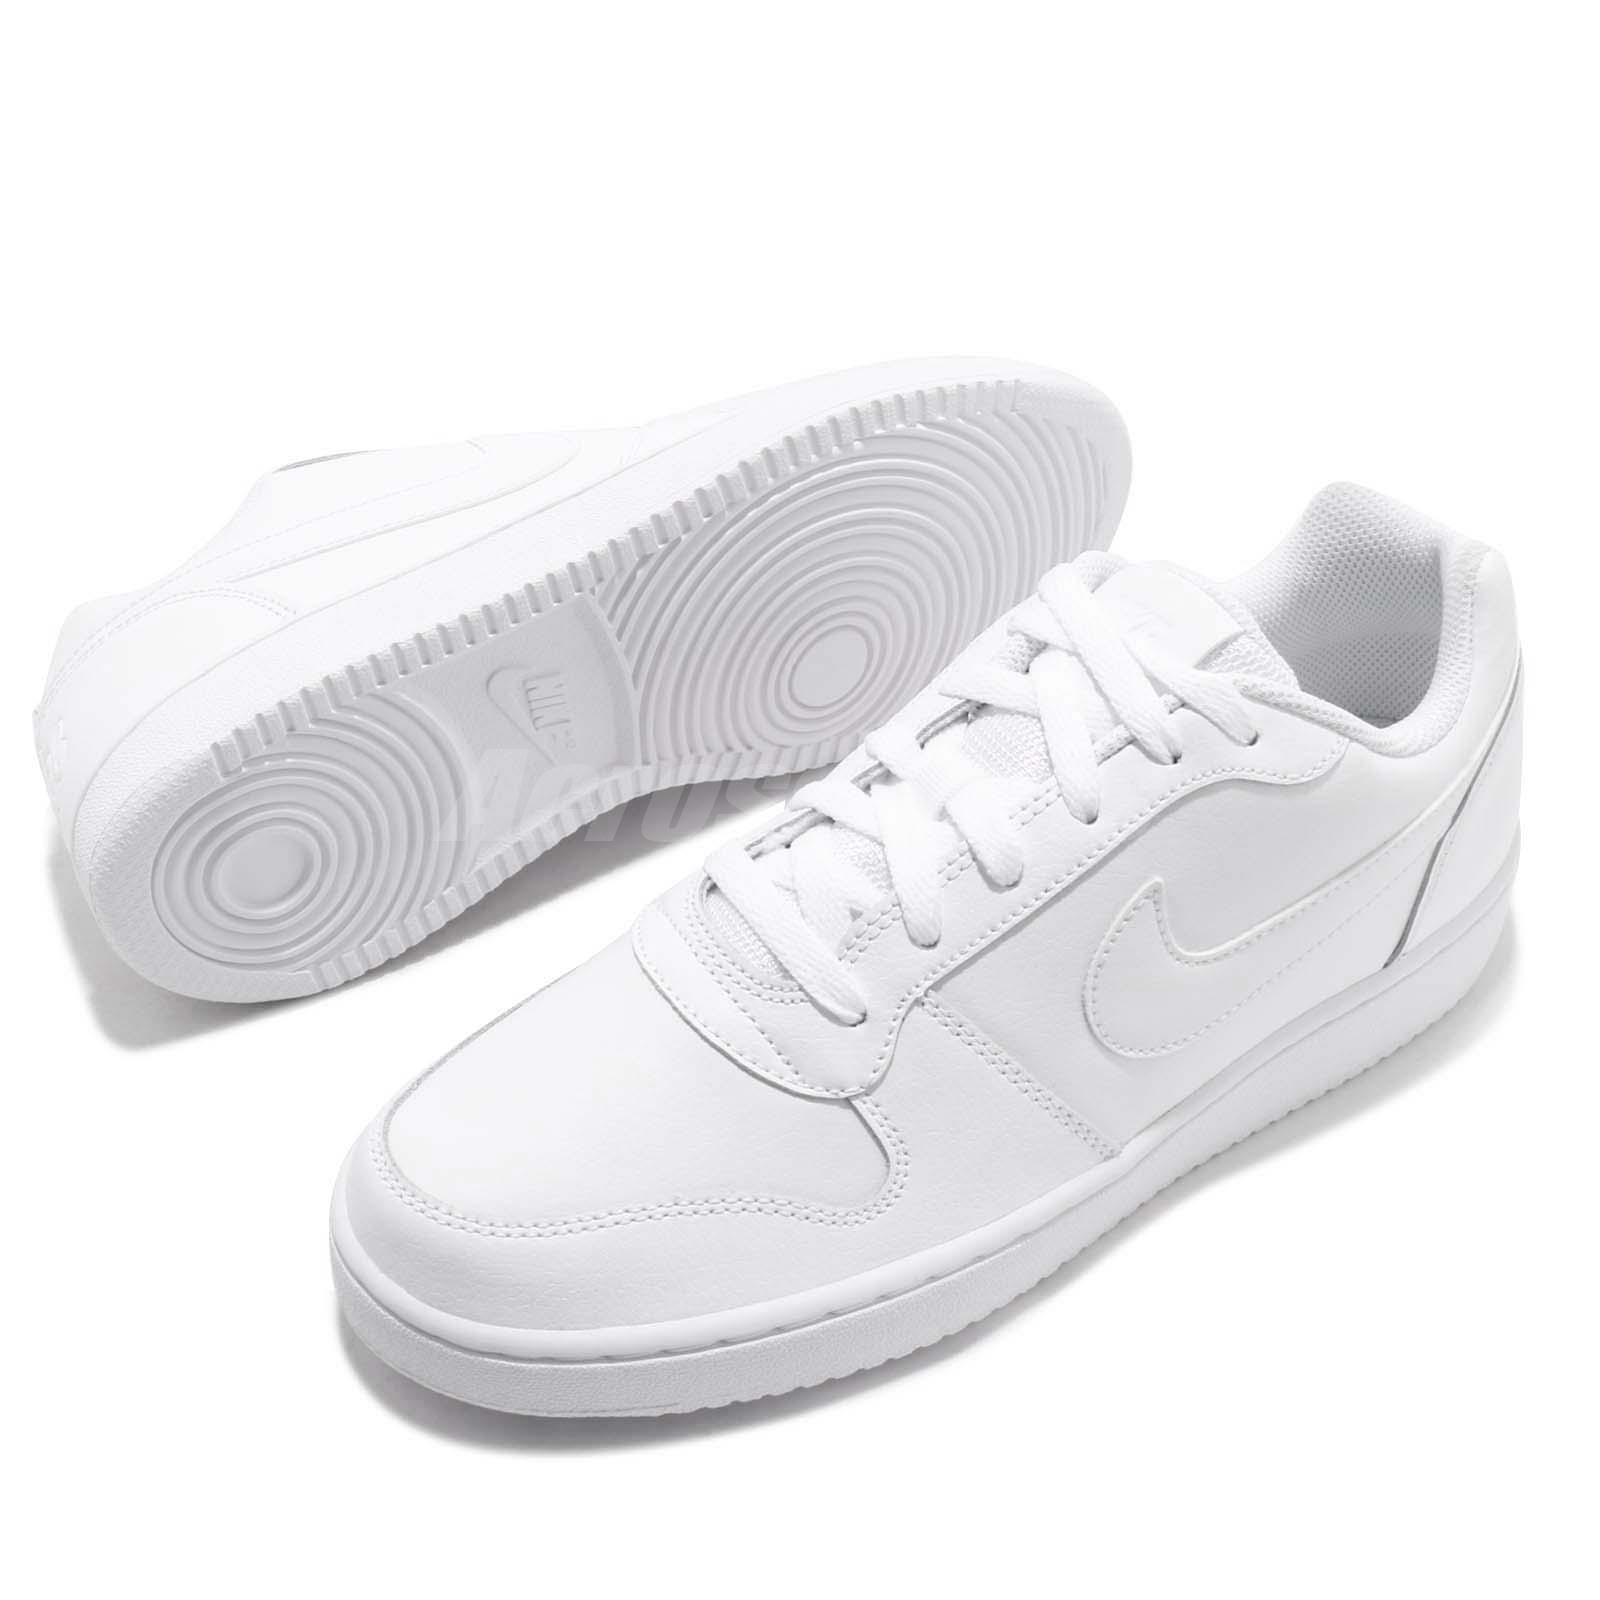 Nike Ebernon Low Triple White Men